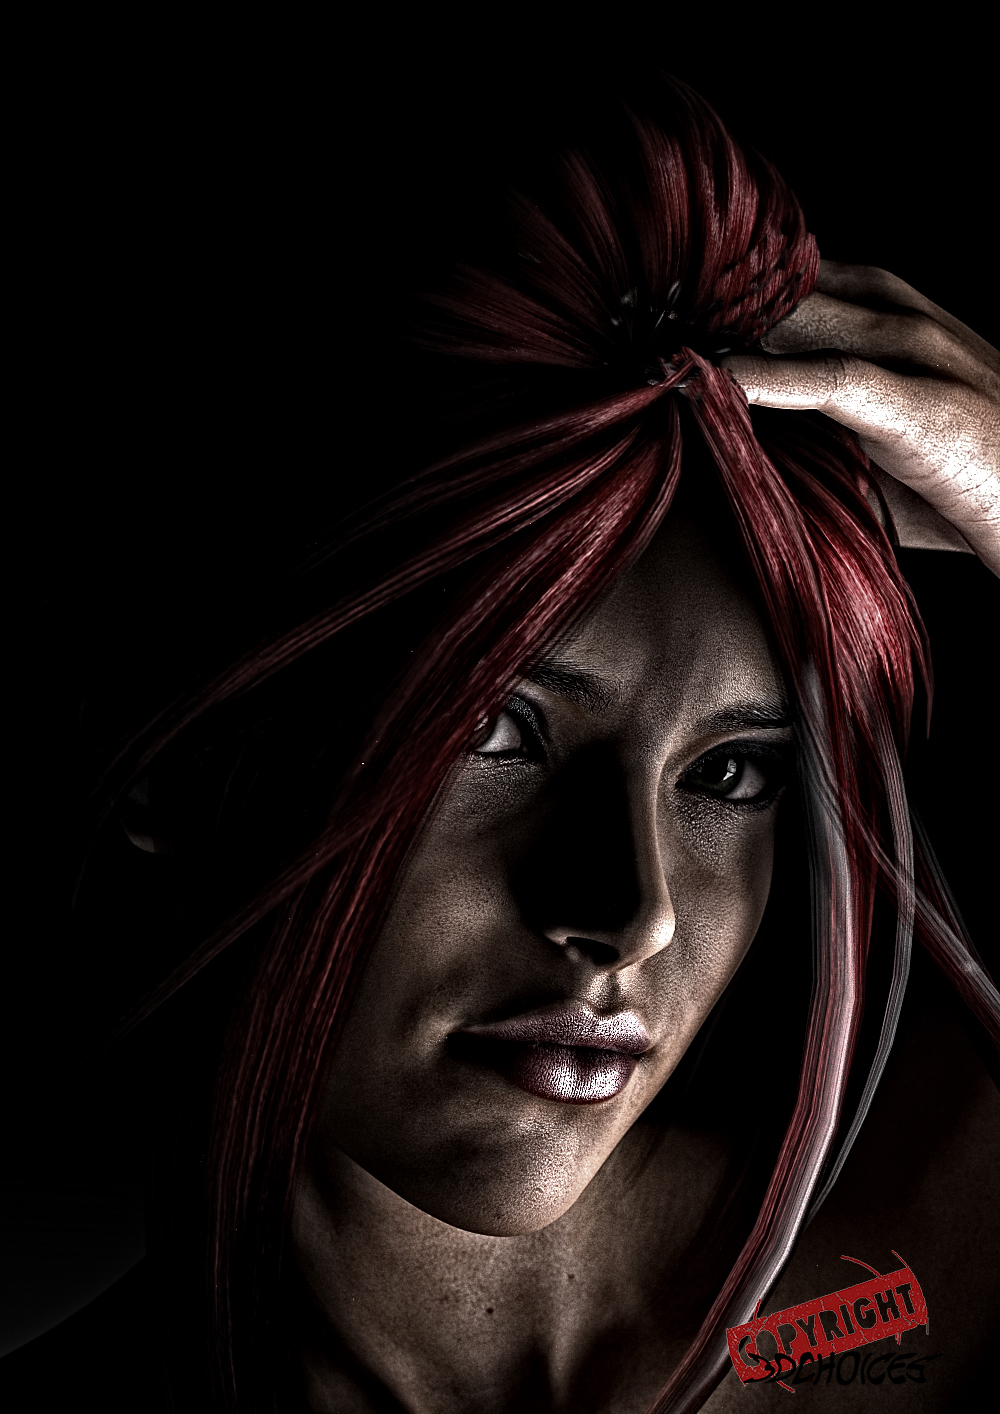 Laura's Portrait by manablo7